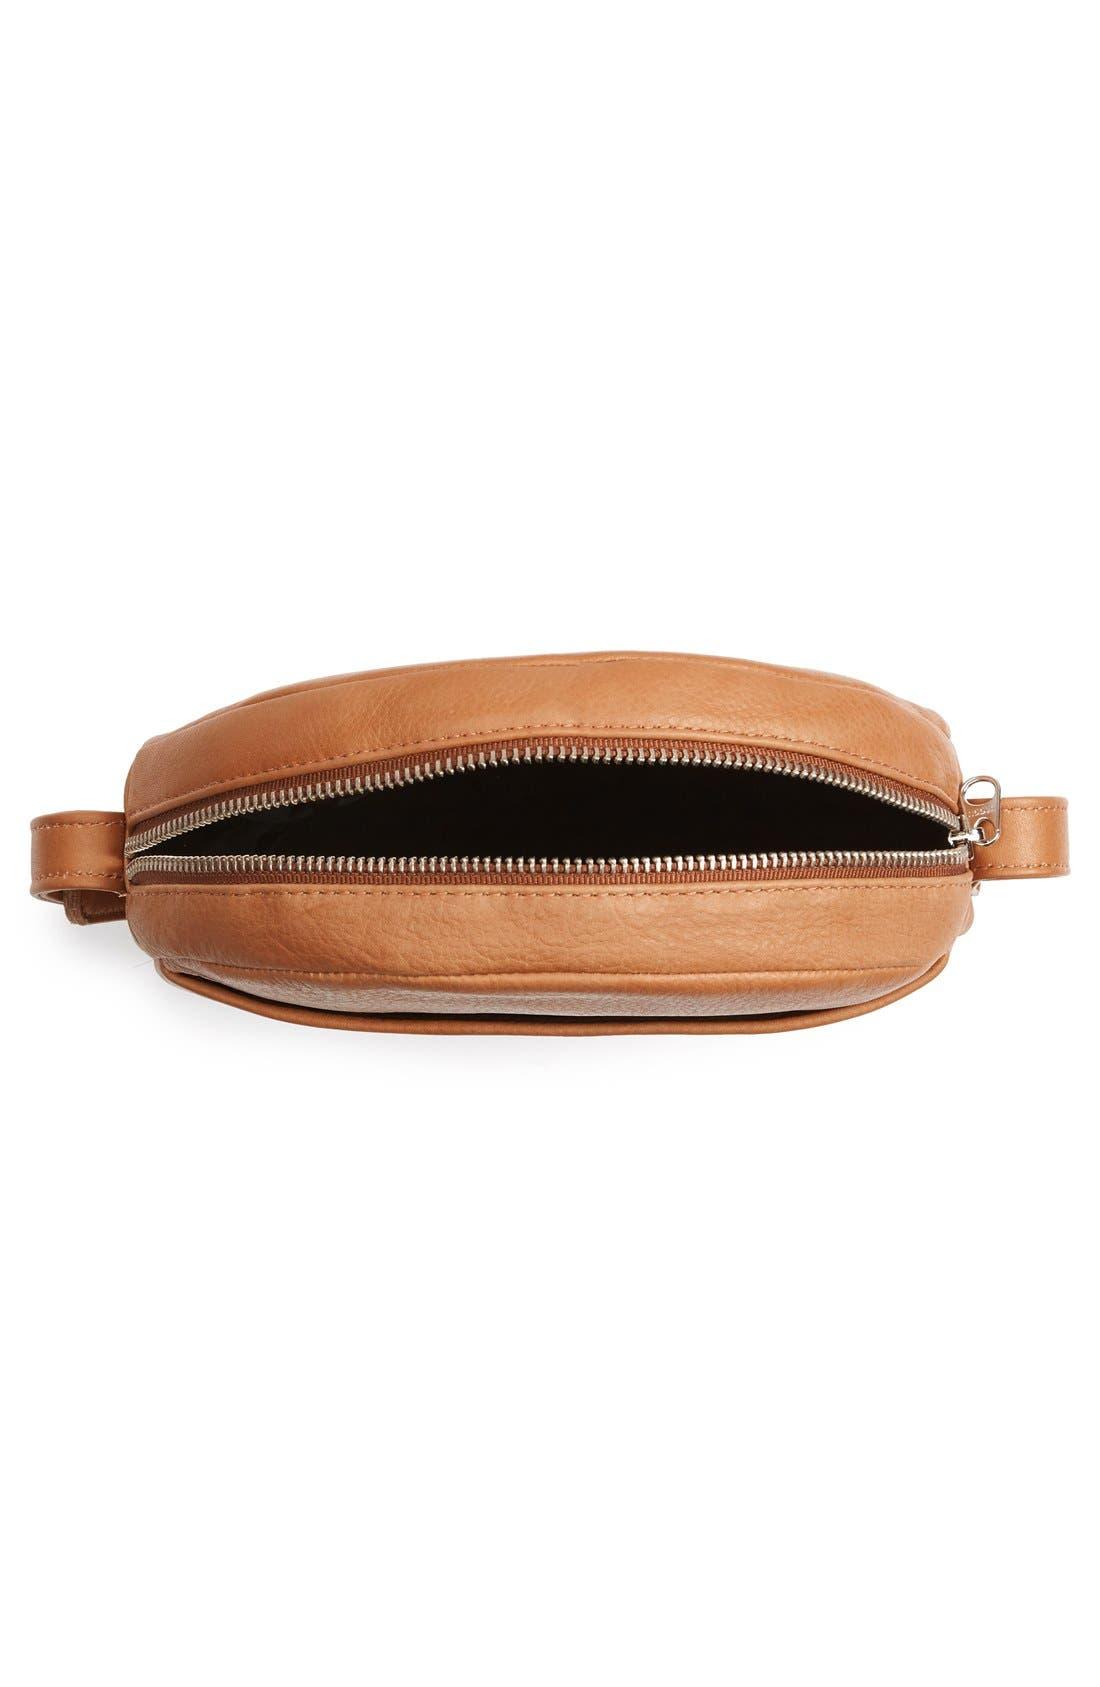 Pebbled Leather Crossbody Bag,                             Alternate thumbnail 16, color,